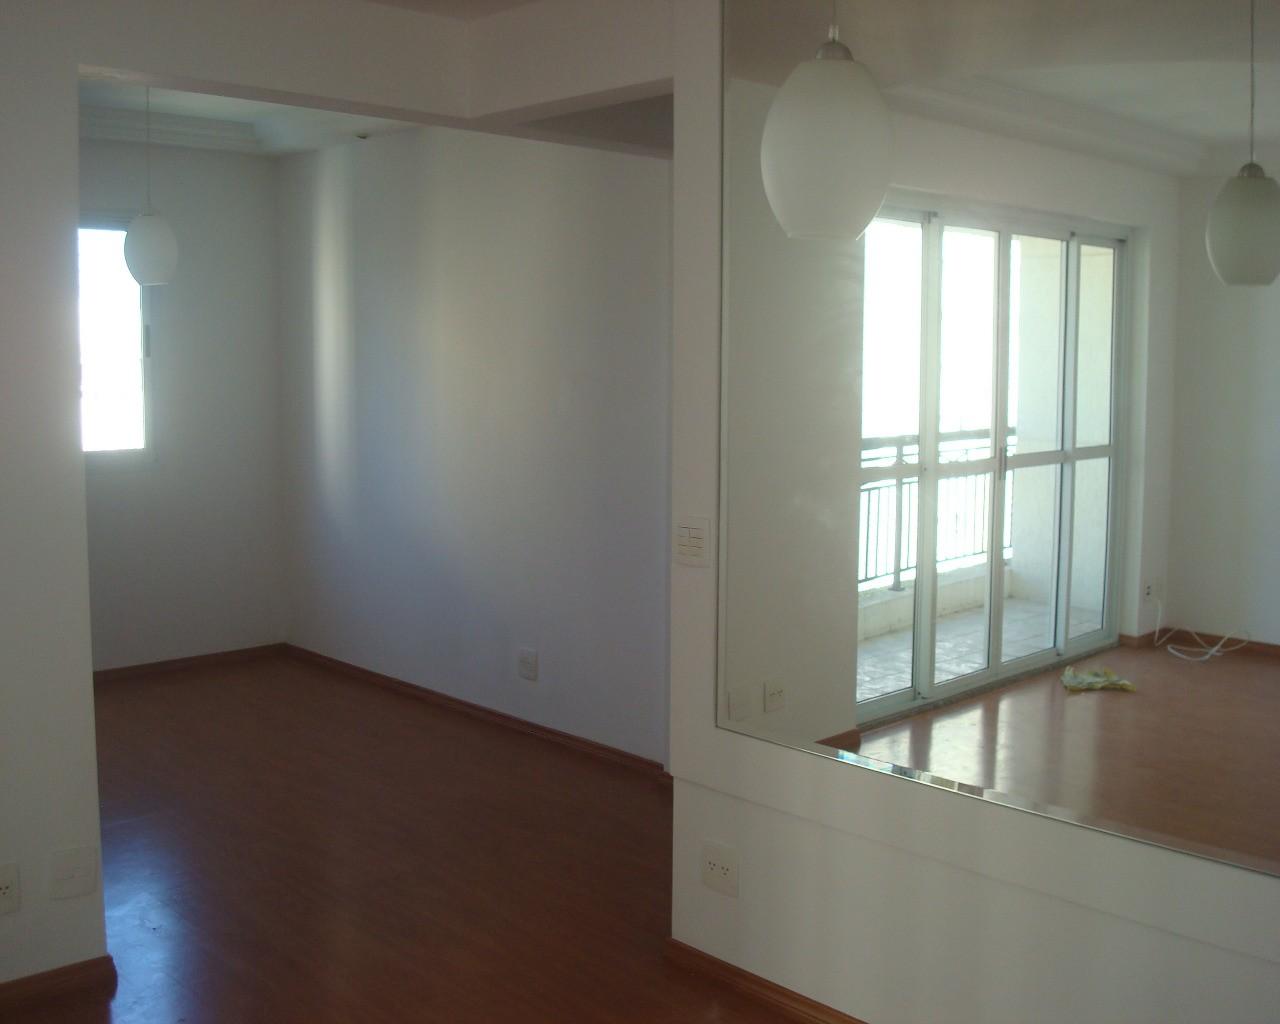 comprar ou alugar apartamento no bairro marajoara na cidade de sao paulo-sp